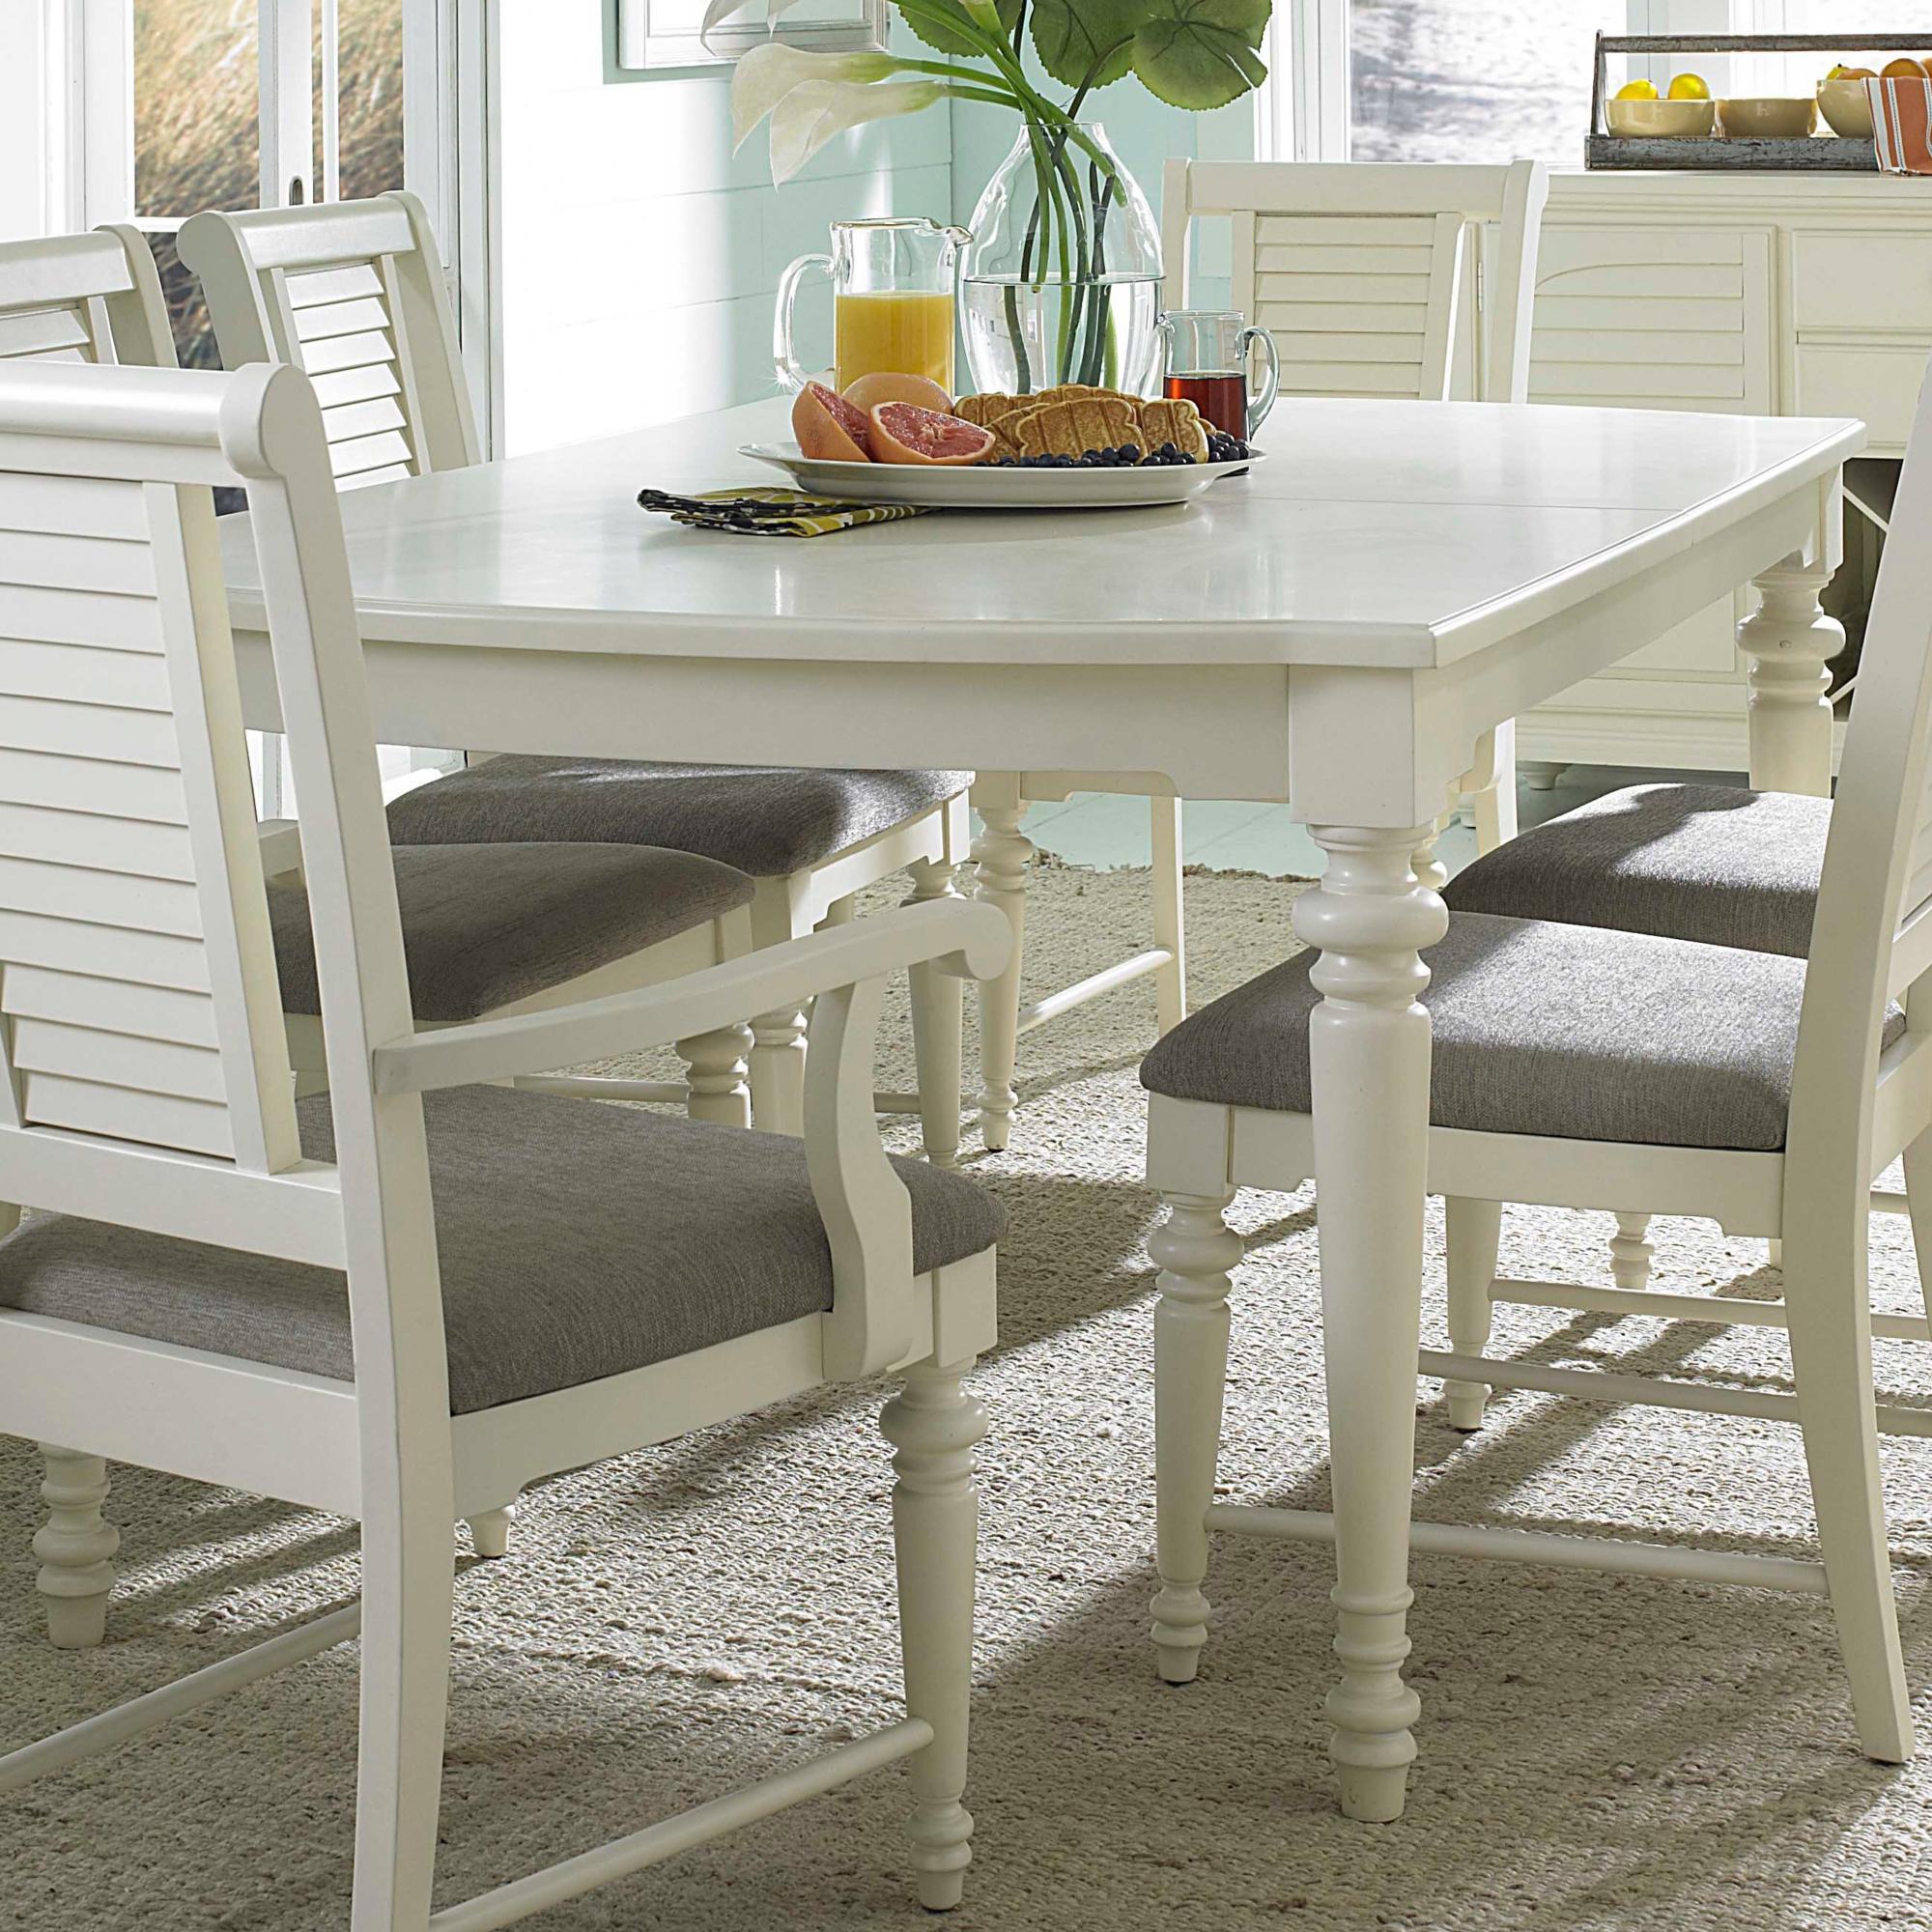 Broyhill Furniture Seabrooke Leg Dining Table : Hudsonu0026#39;s Furniture  : Dining Room